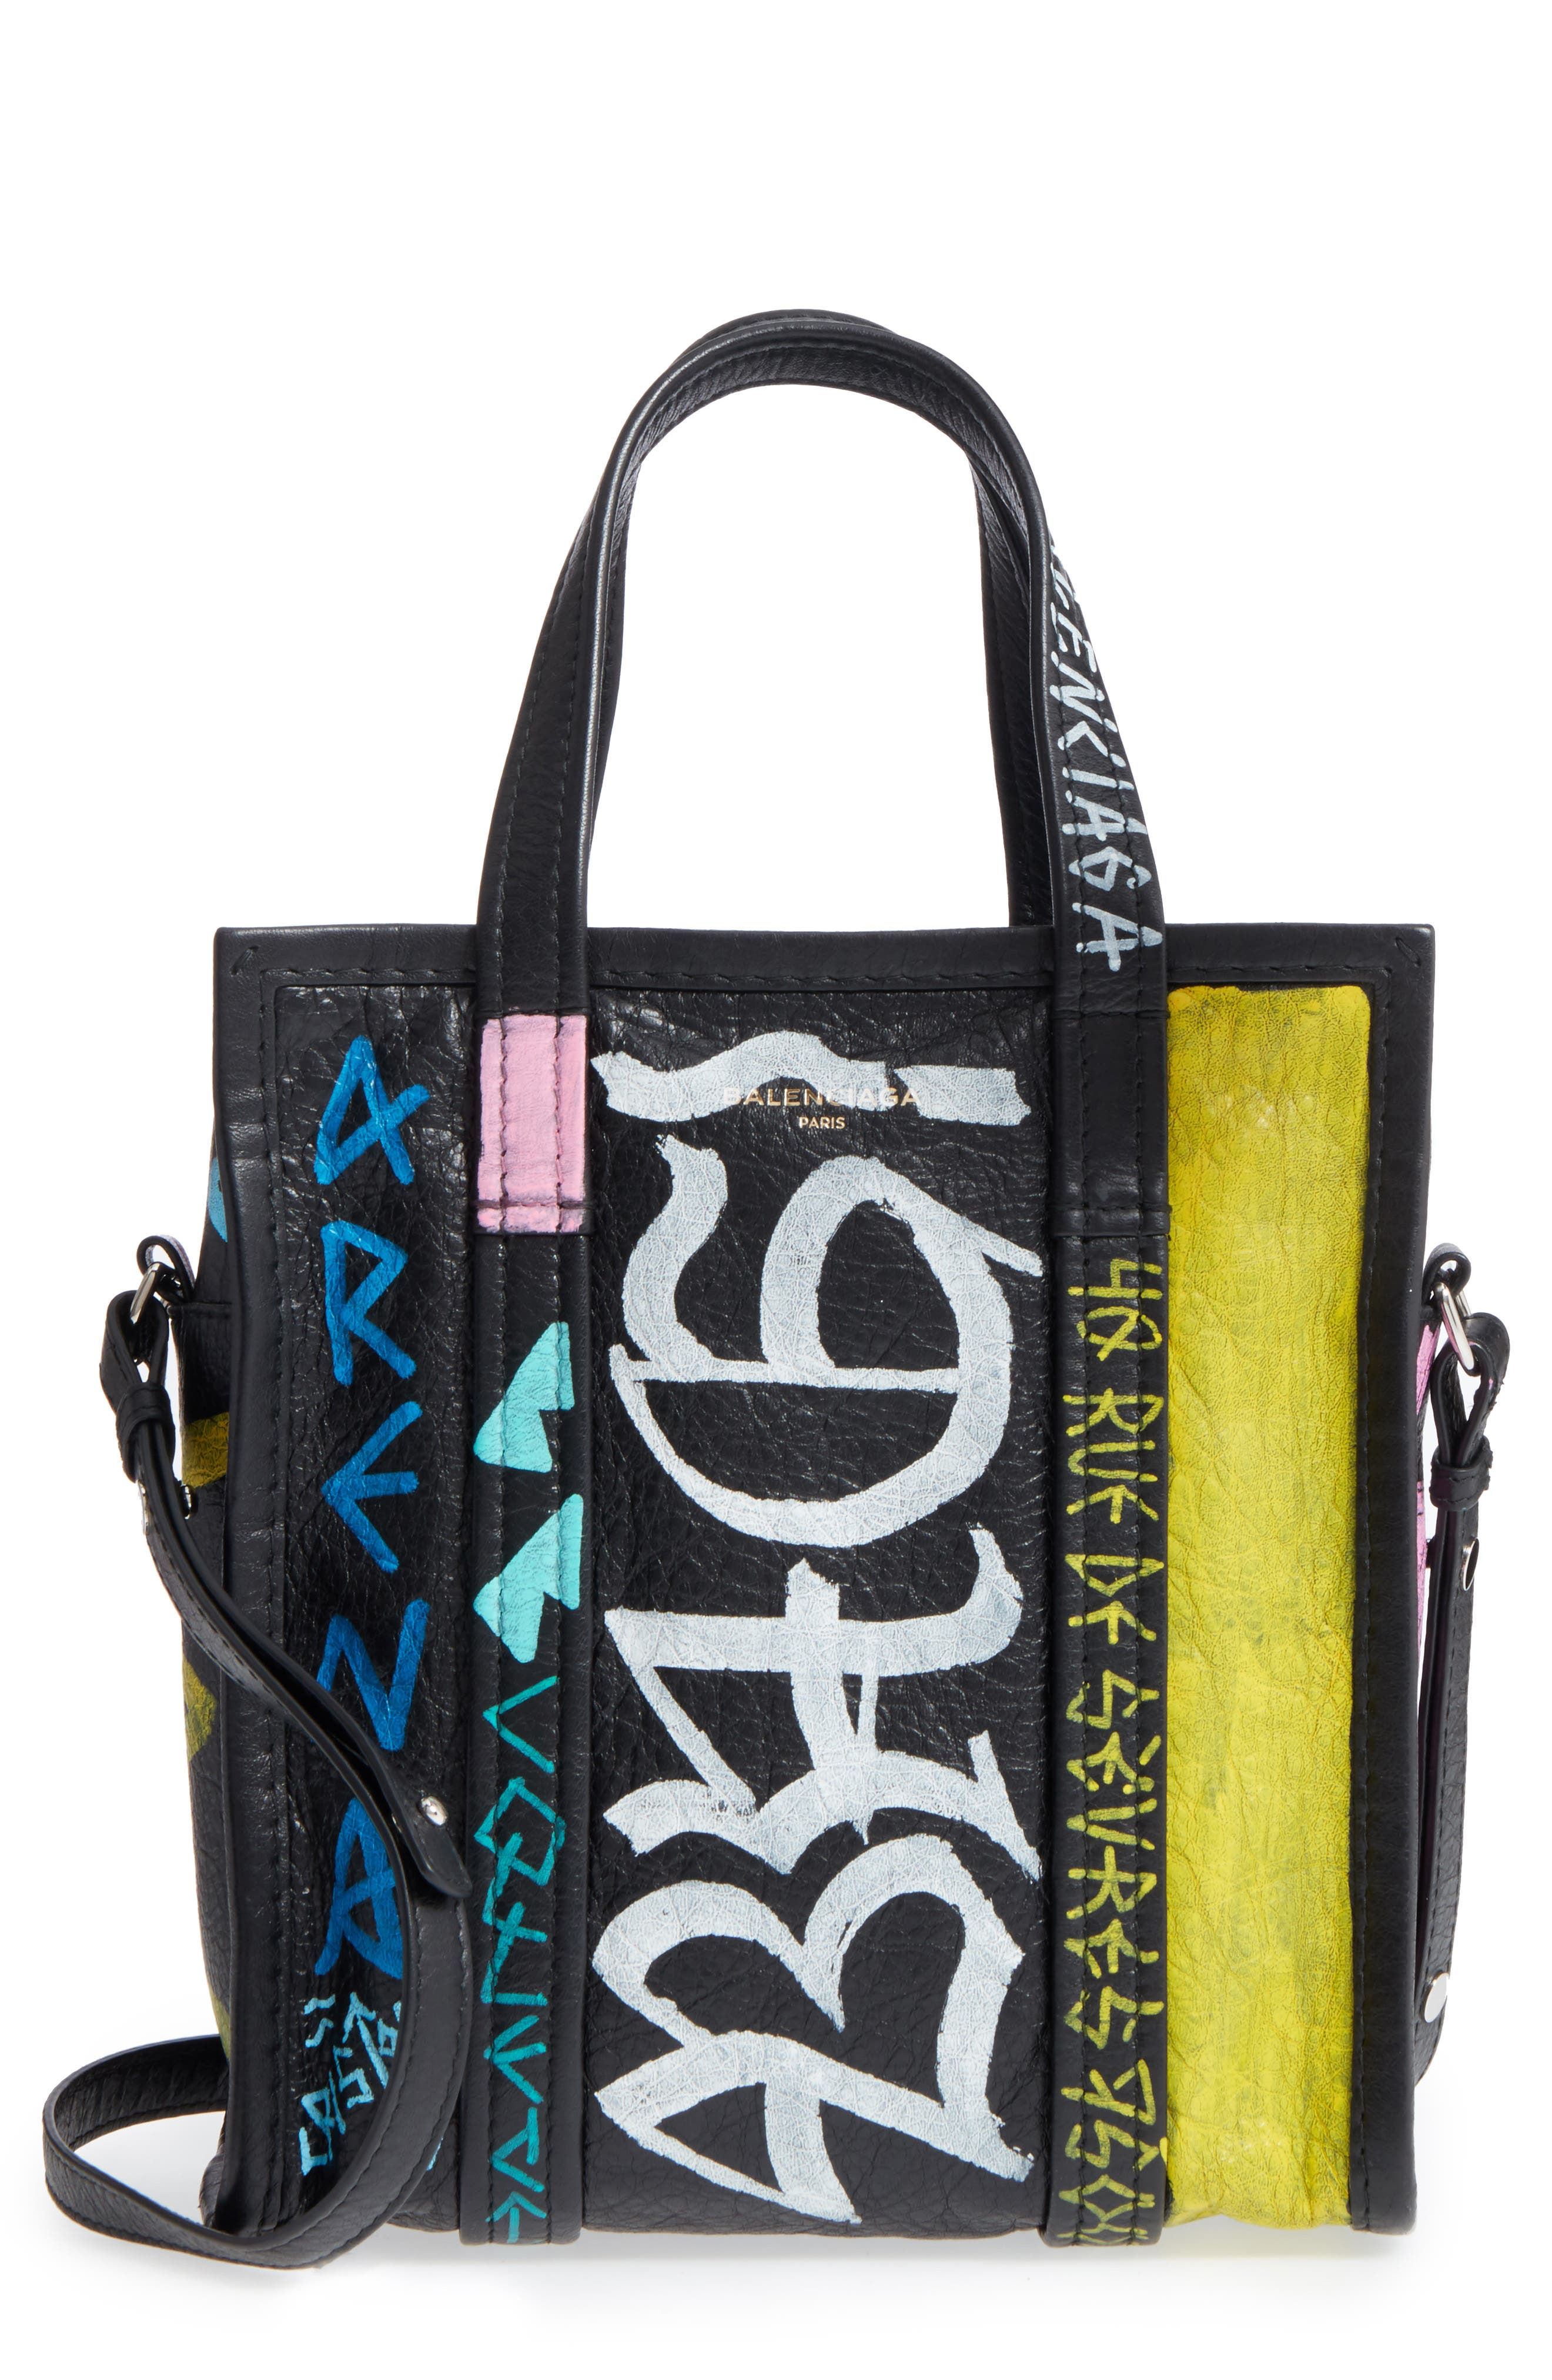 Extra Small Bazar Graffiti Lambskin Shopper,                         Main,                         color, Noir/ Multi Color